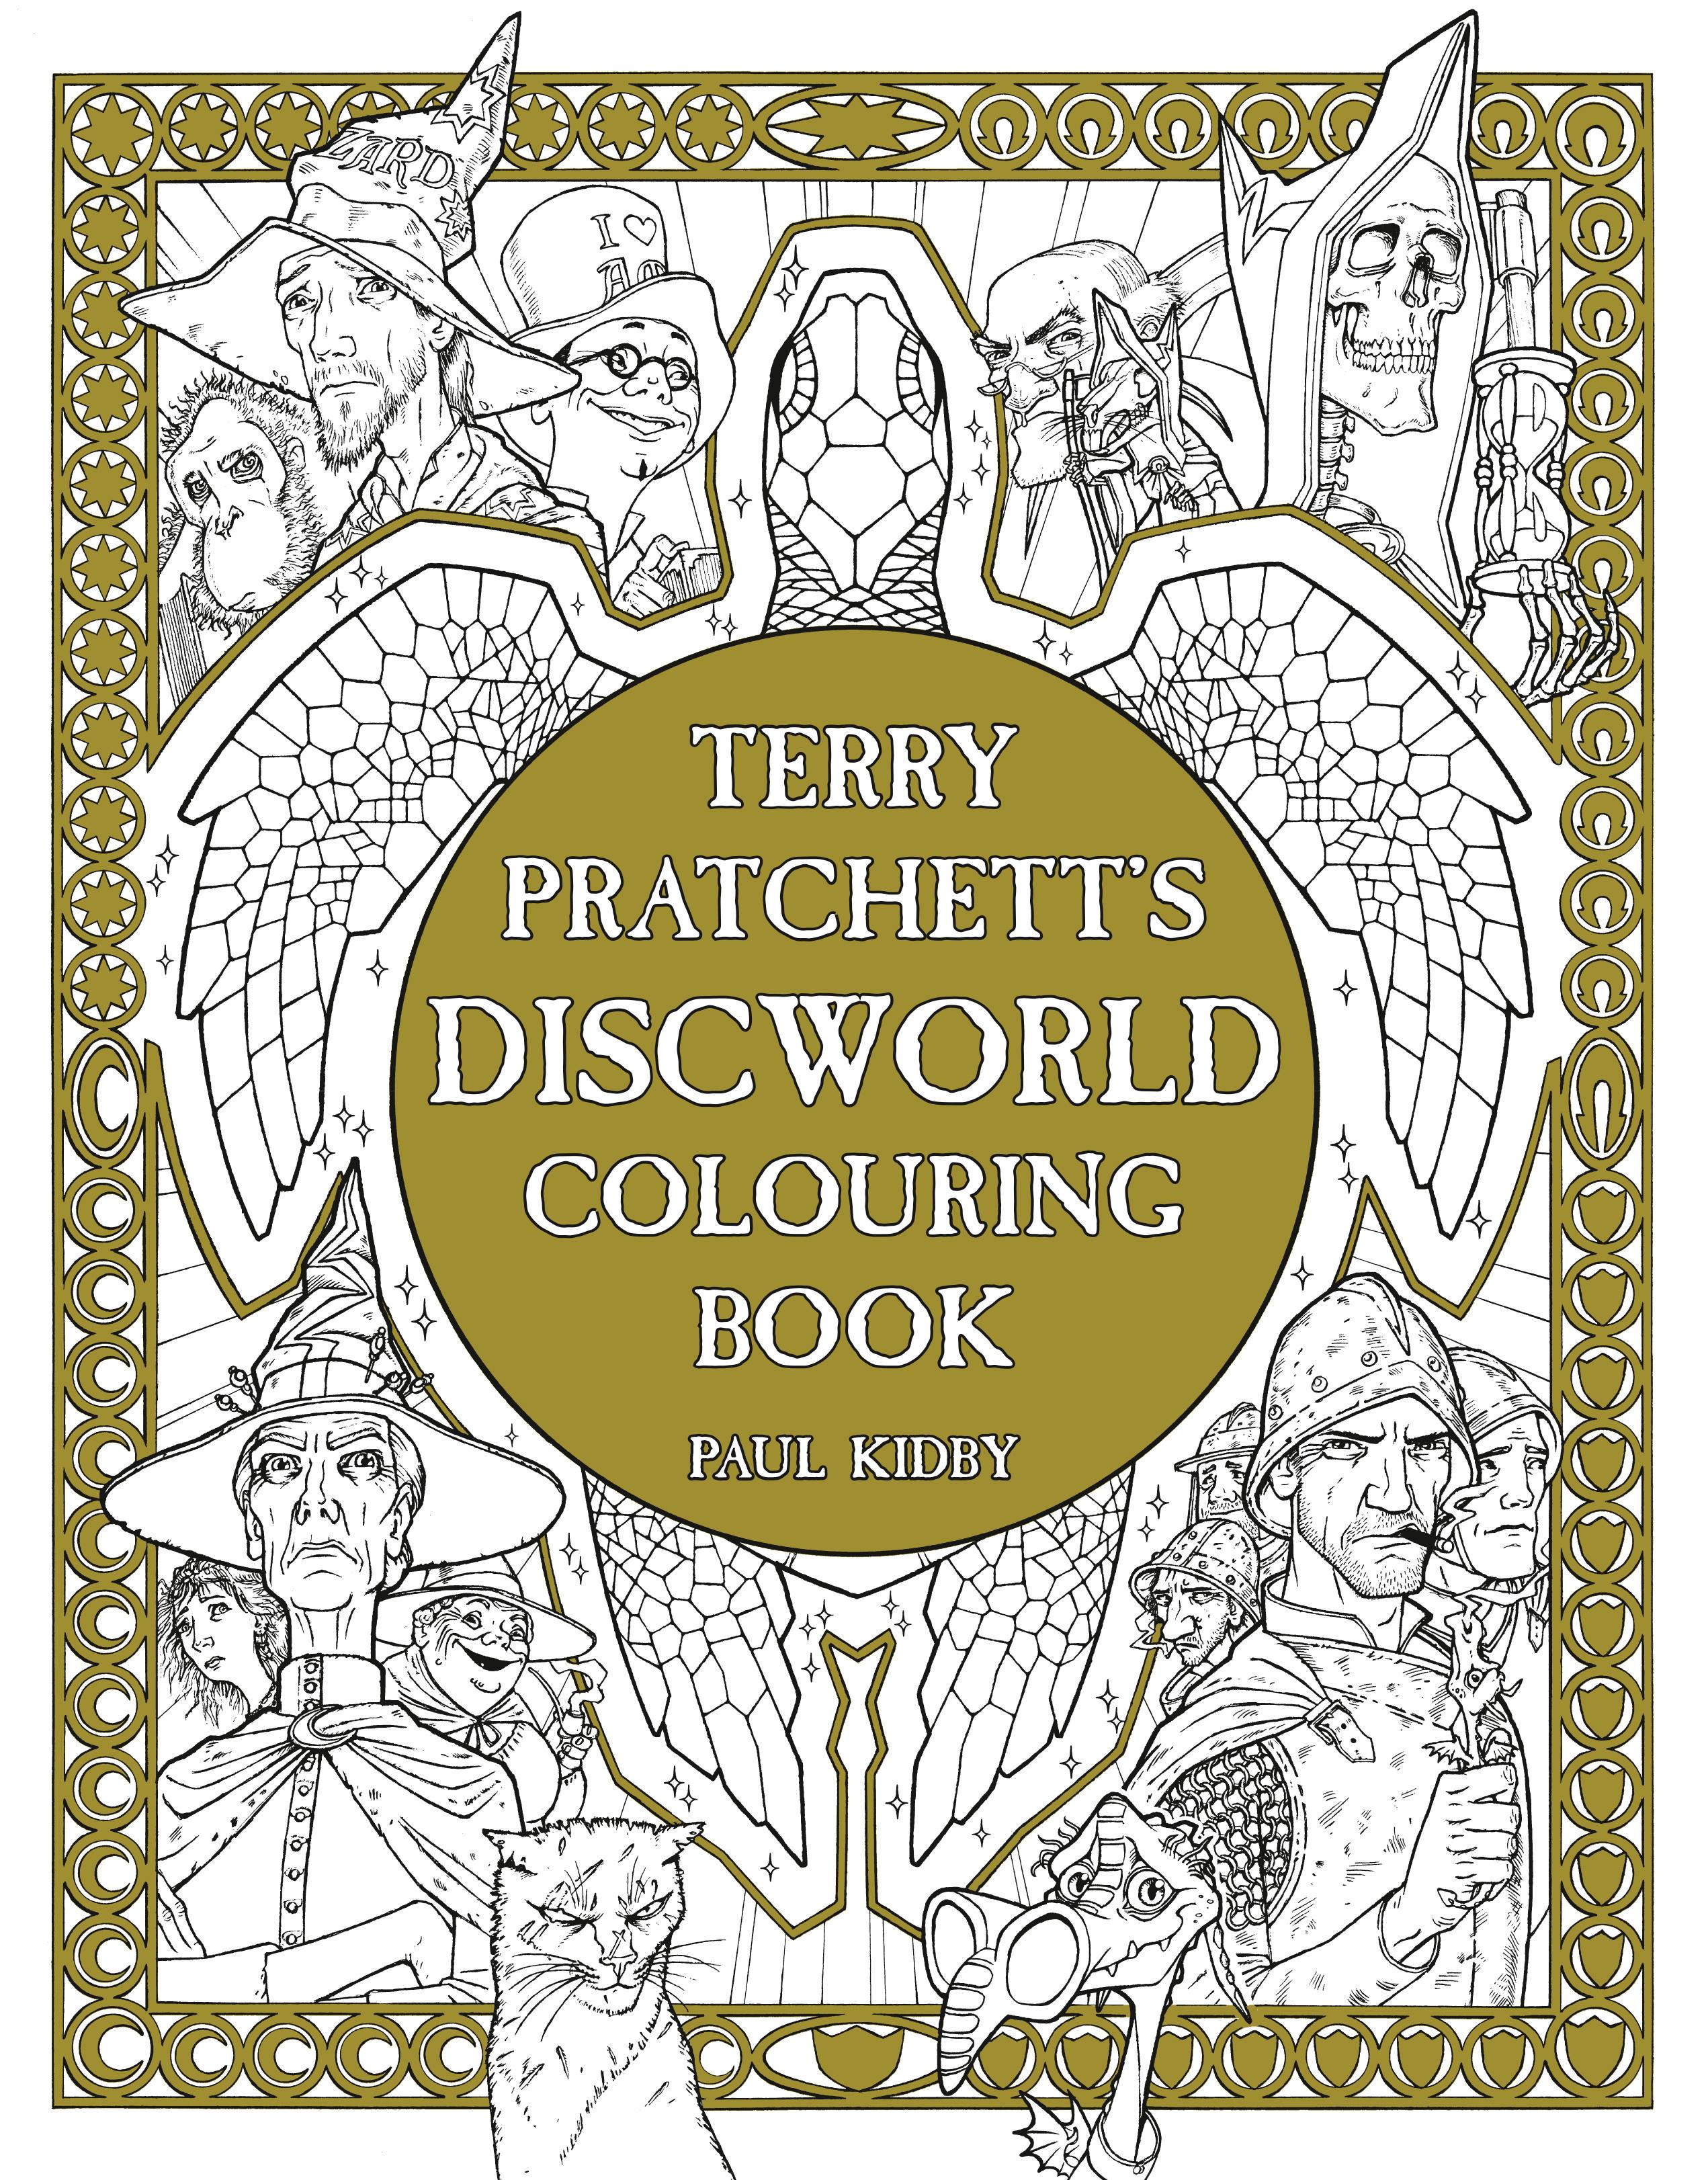 Terry Pratchetts Discworld Colouring Book